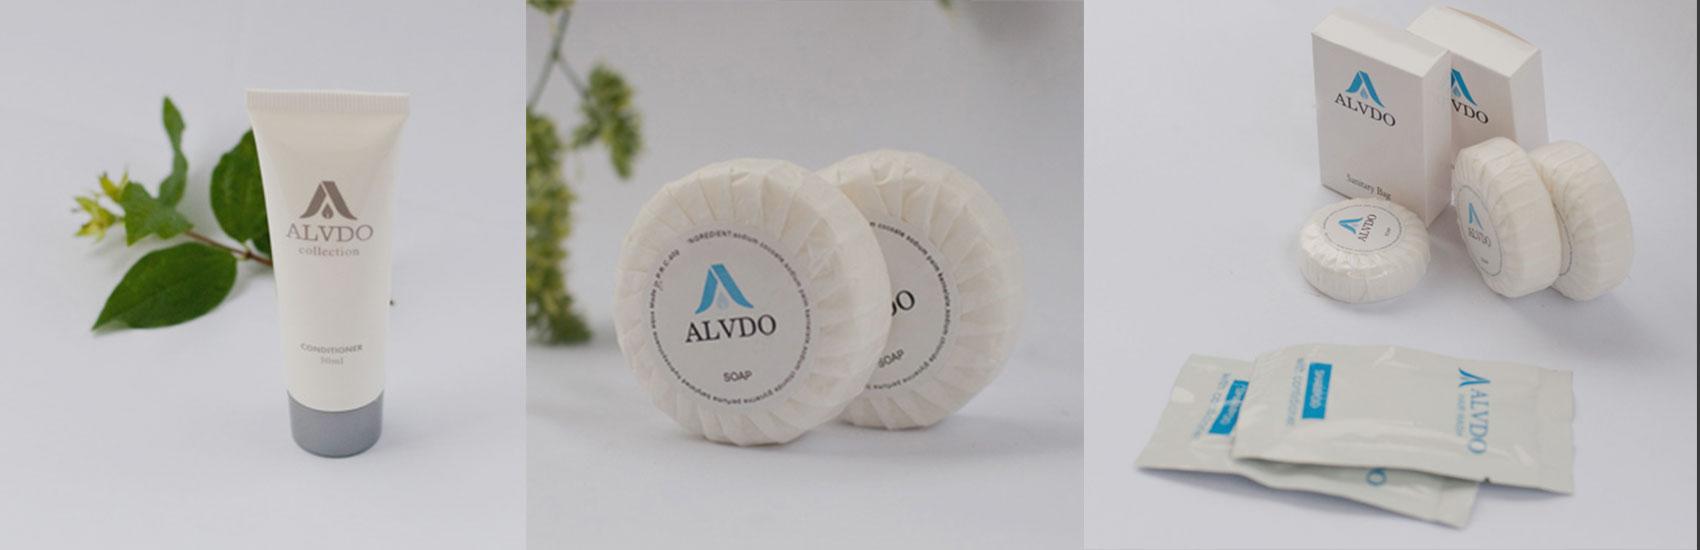 Alvdo - Bulk WholeSale